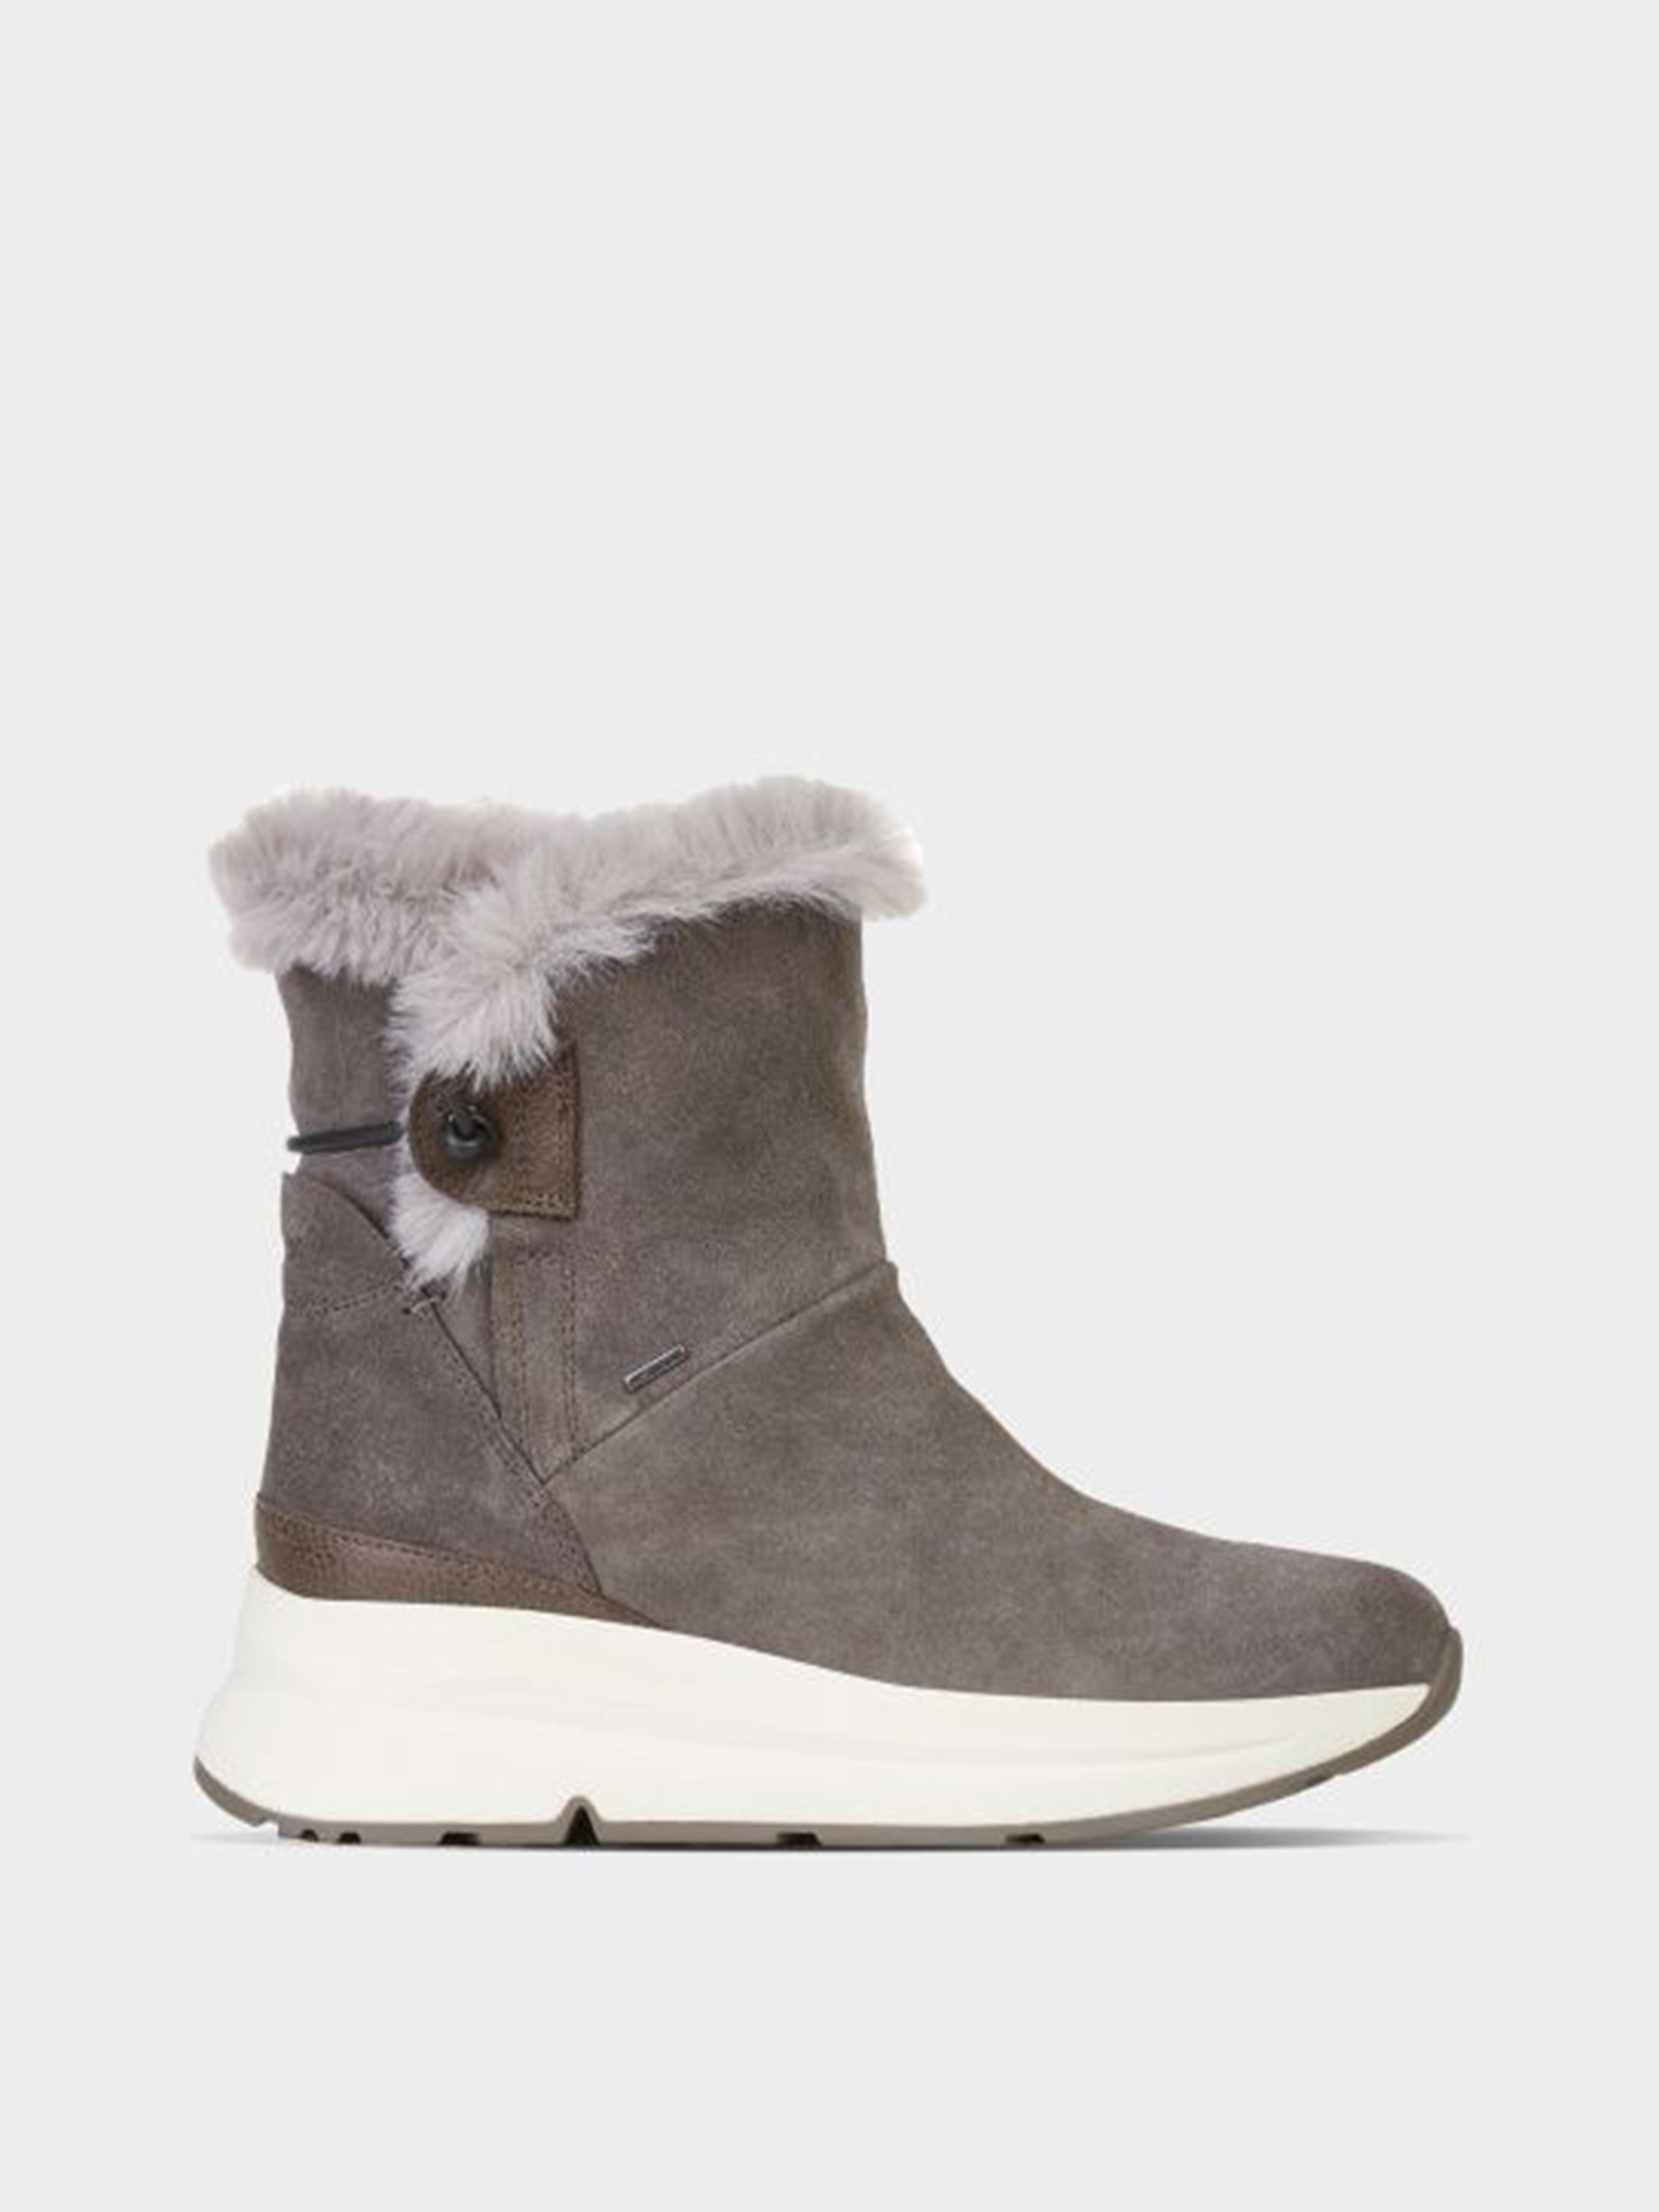 Купить Ботинки женские Geox D BACKSIE B ABX XW3716, Коричневый